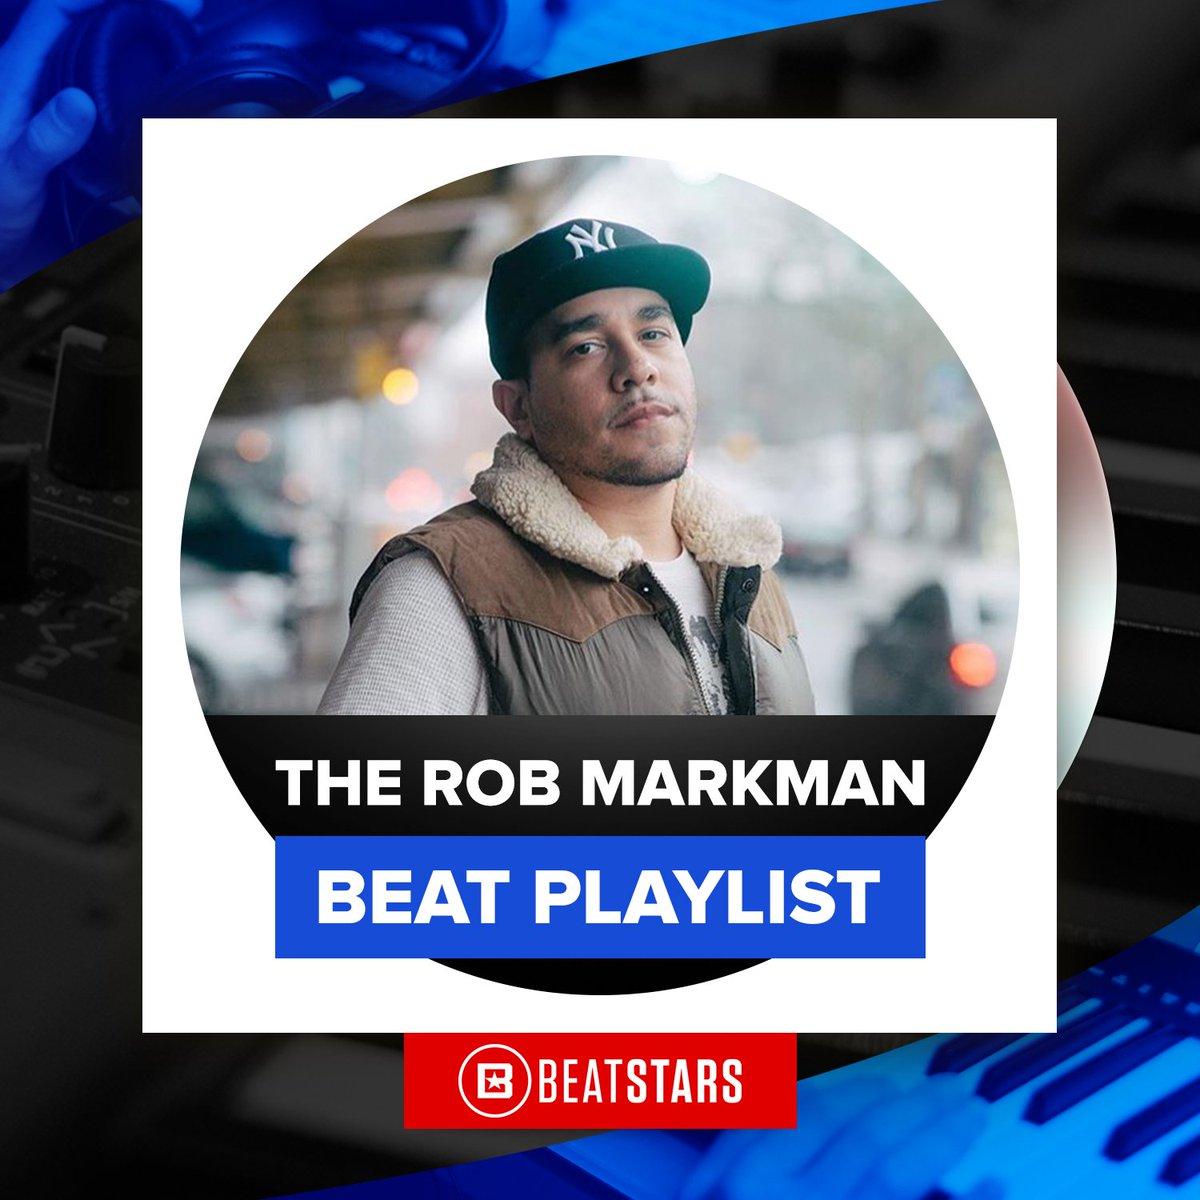 .@RobMarkman of @Genius&#39; #BeatStars #Playlist (Part 1) features some of @BeatStars Best Beats + Producers --&gt;  http:// bsta.rs/pl/921261  &nbsp;  <br>http://pic.twitter.com/jQGWjrBRDx